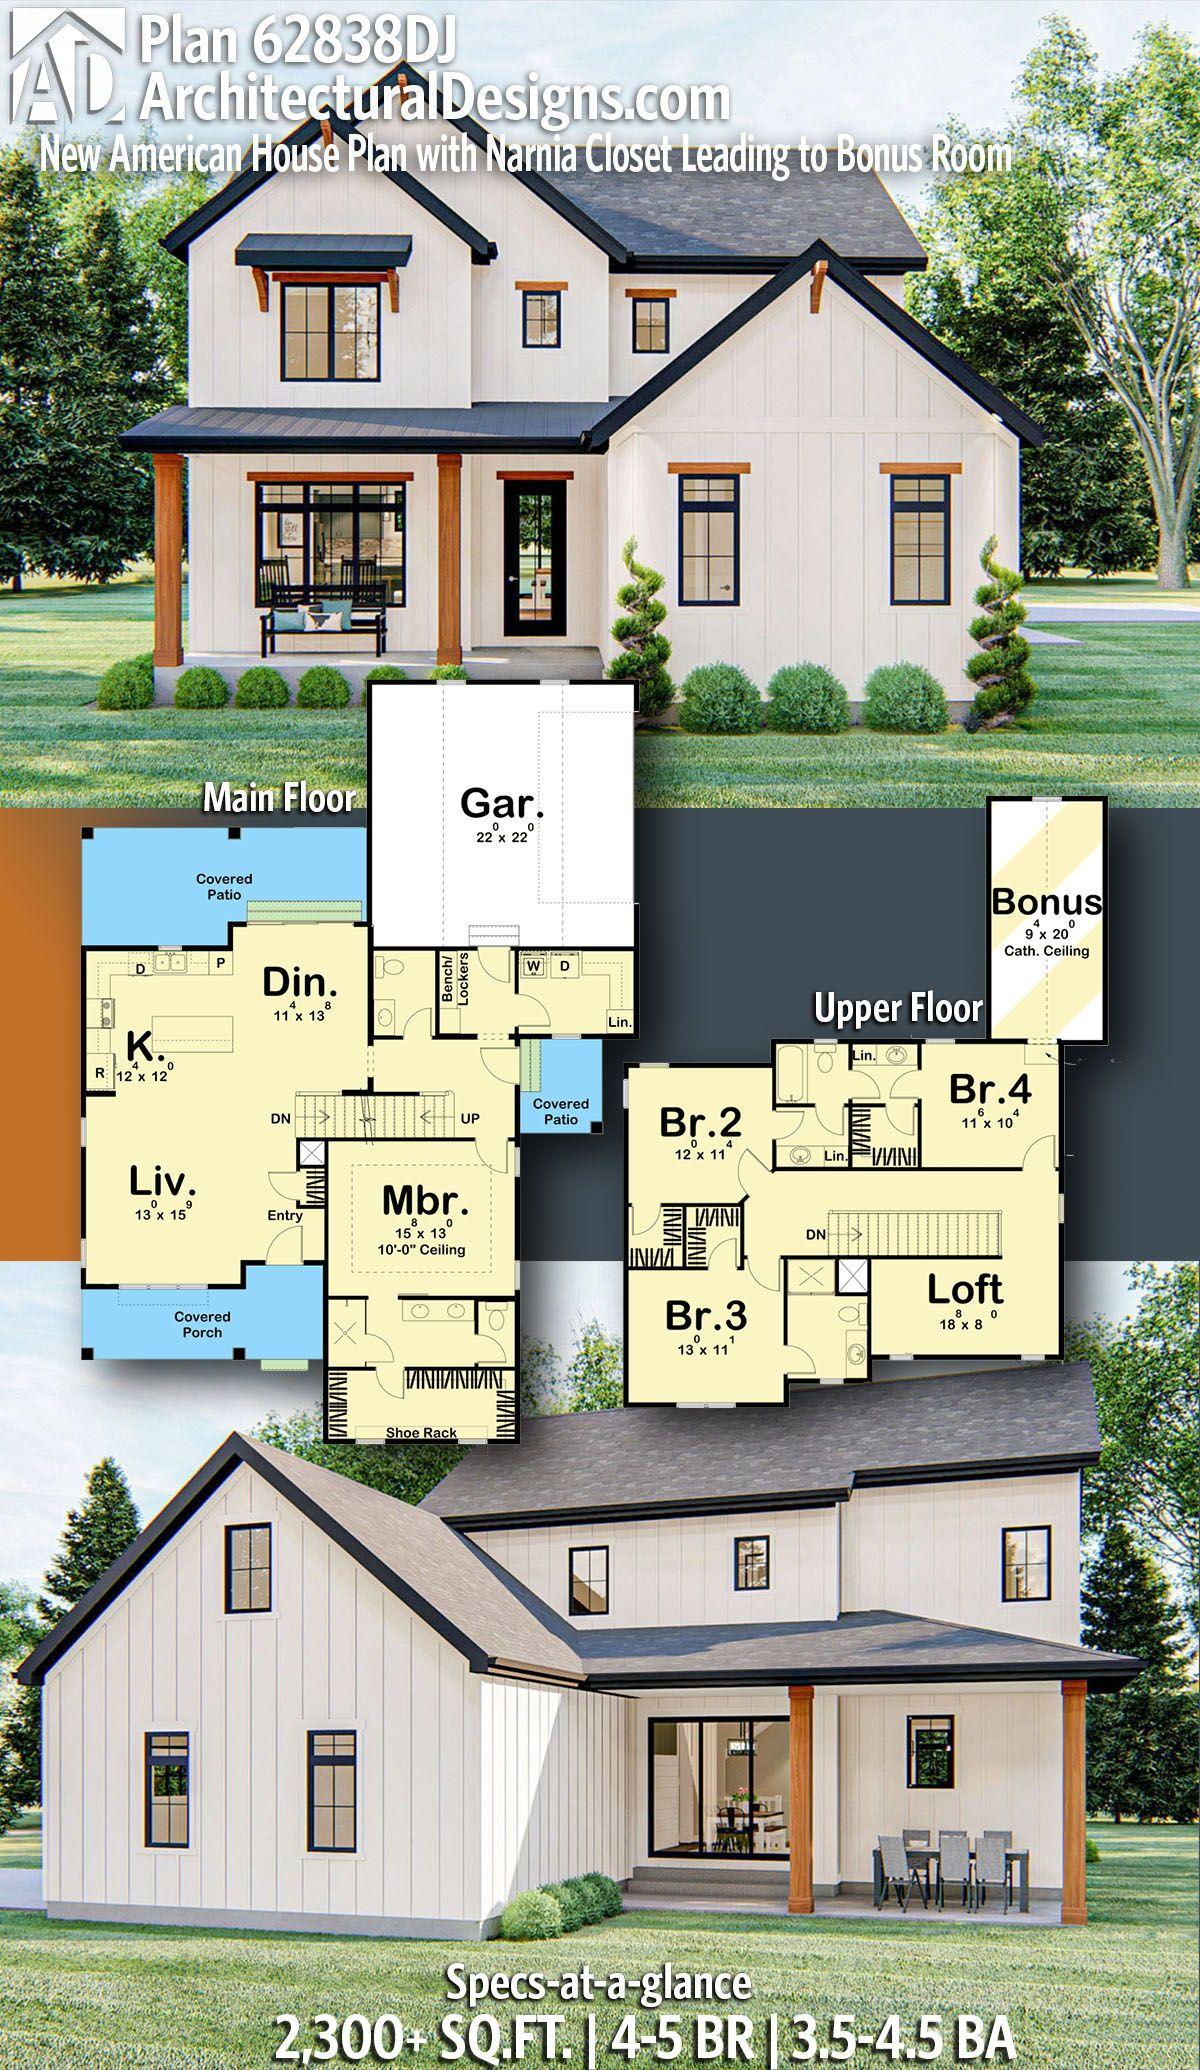 Plan 62838dj New American House Plan With Narnia Closet Leading To Bonus Room In 2020 Modern Farmhouse Plans Craftsman House Plans Farmhouse Plans